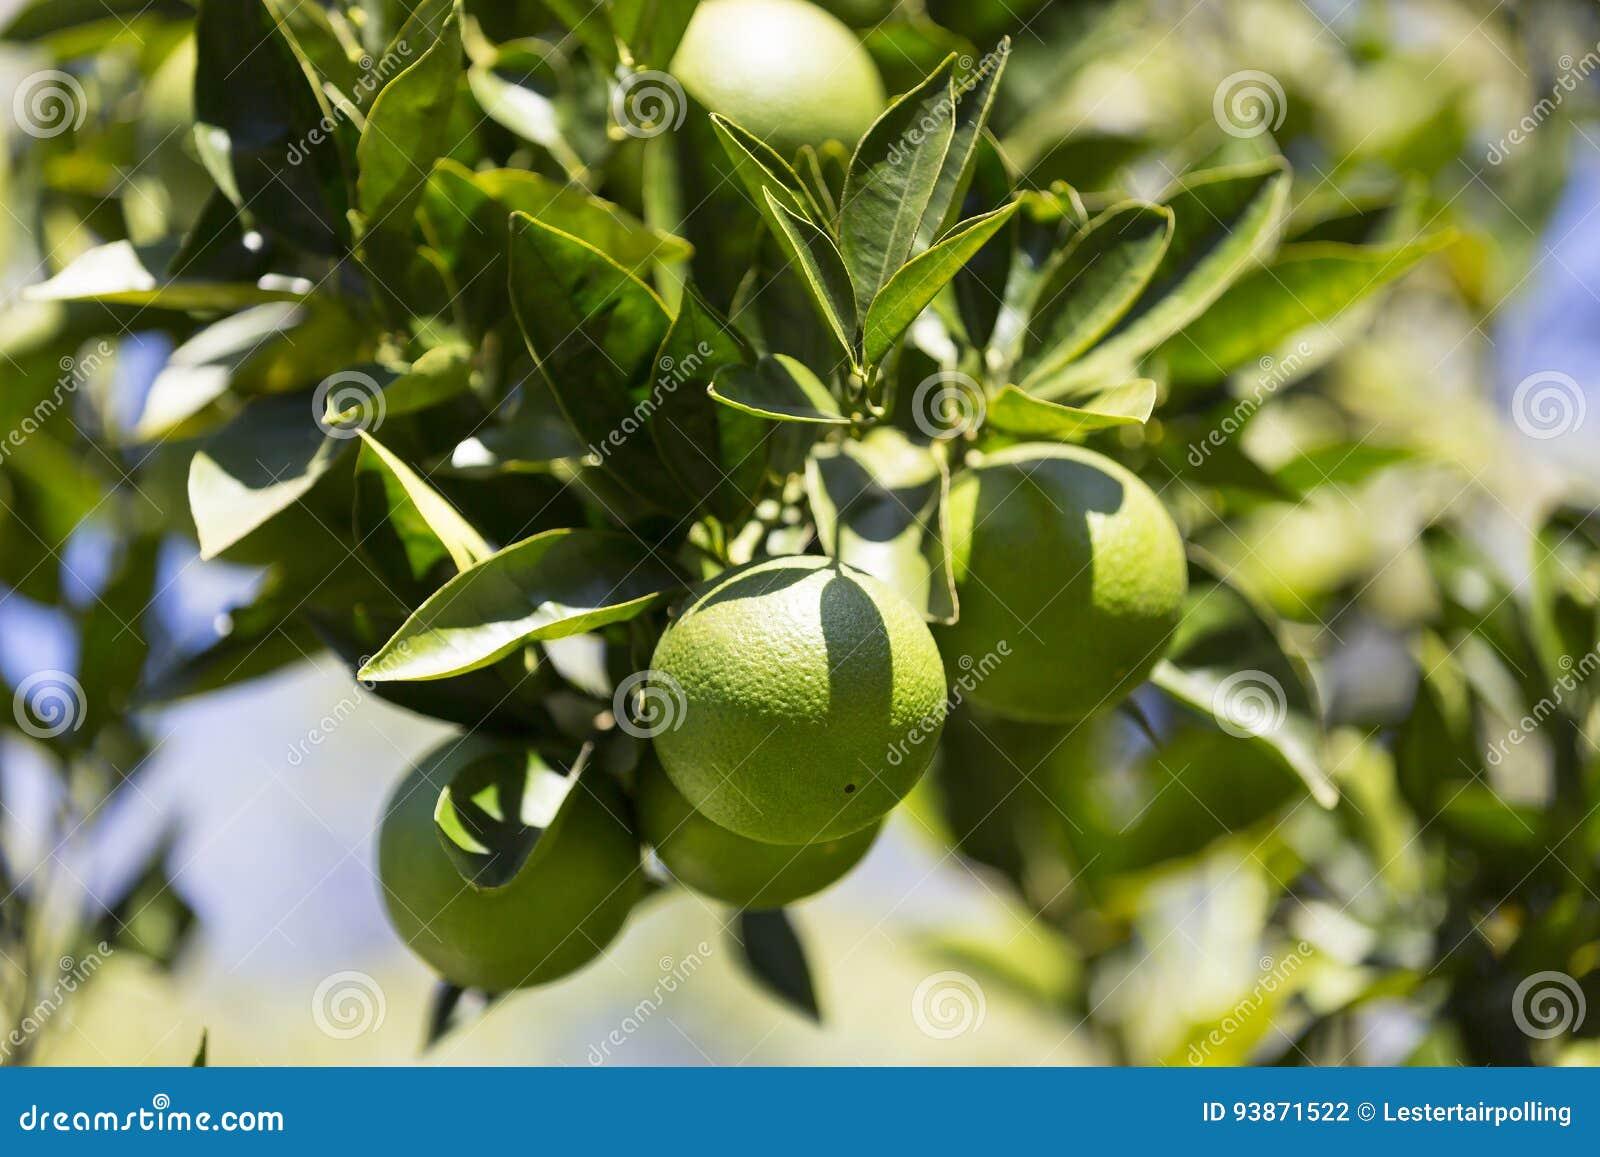 Оранжевое дерево с плодоовощами зреет